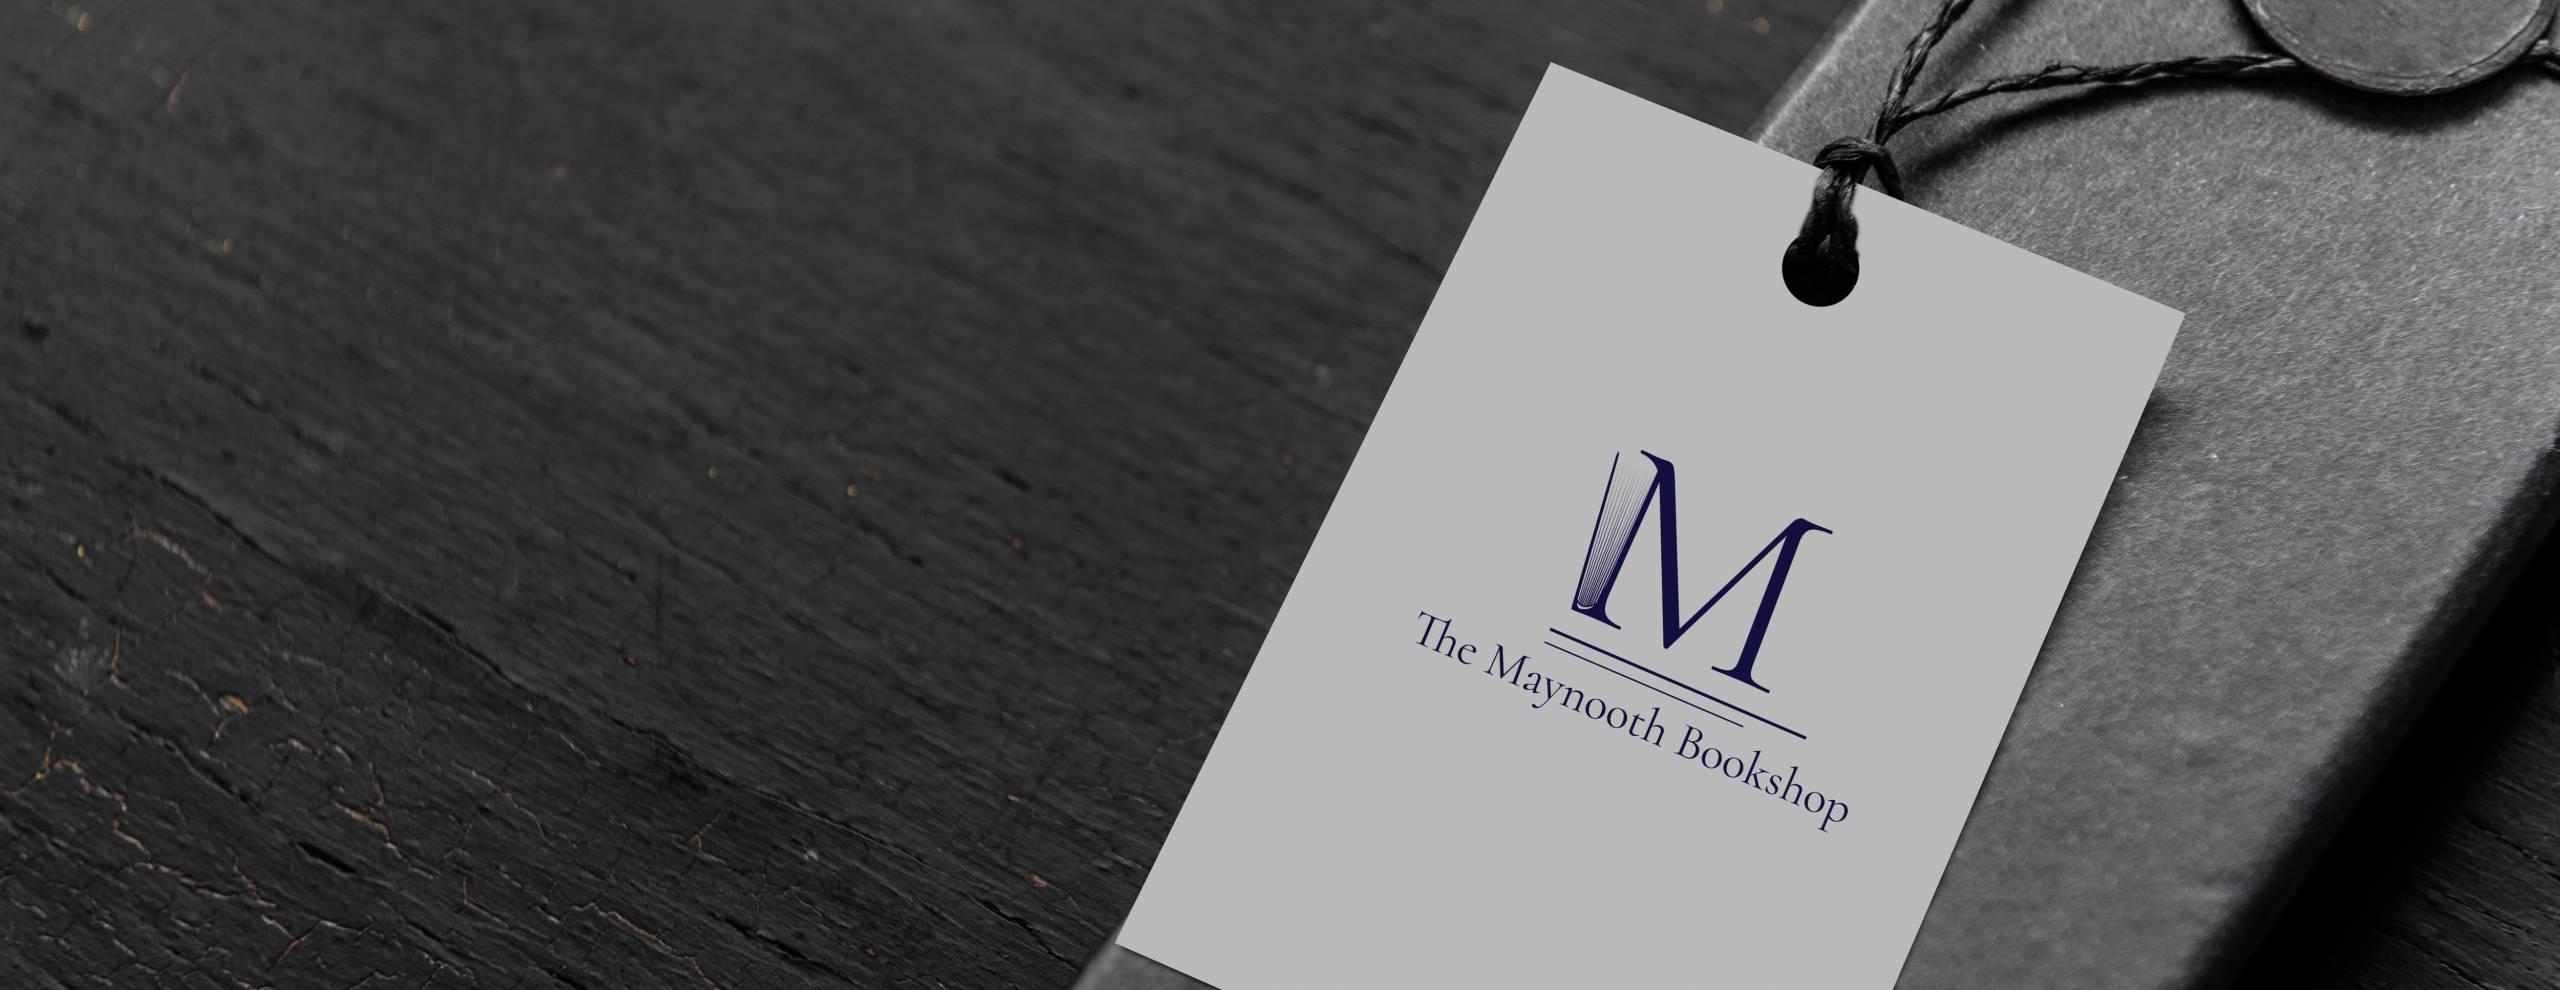 maynooth-book-3